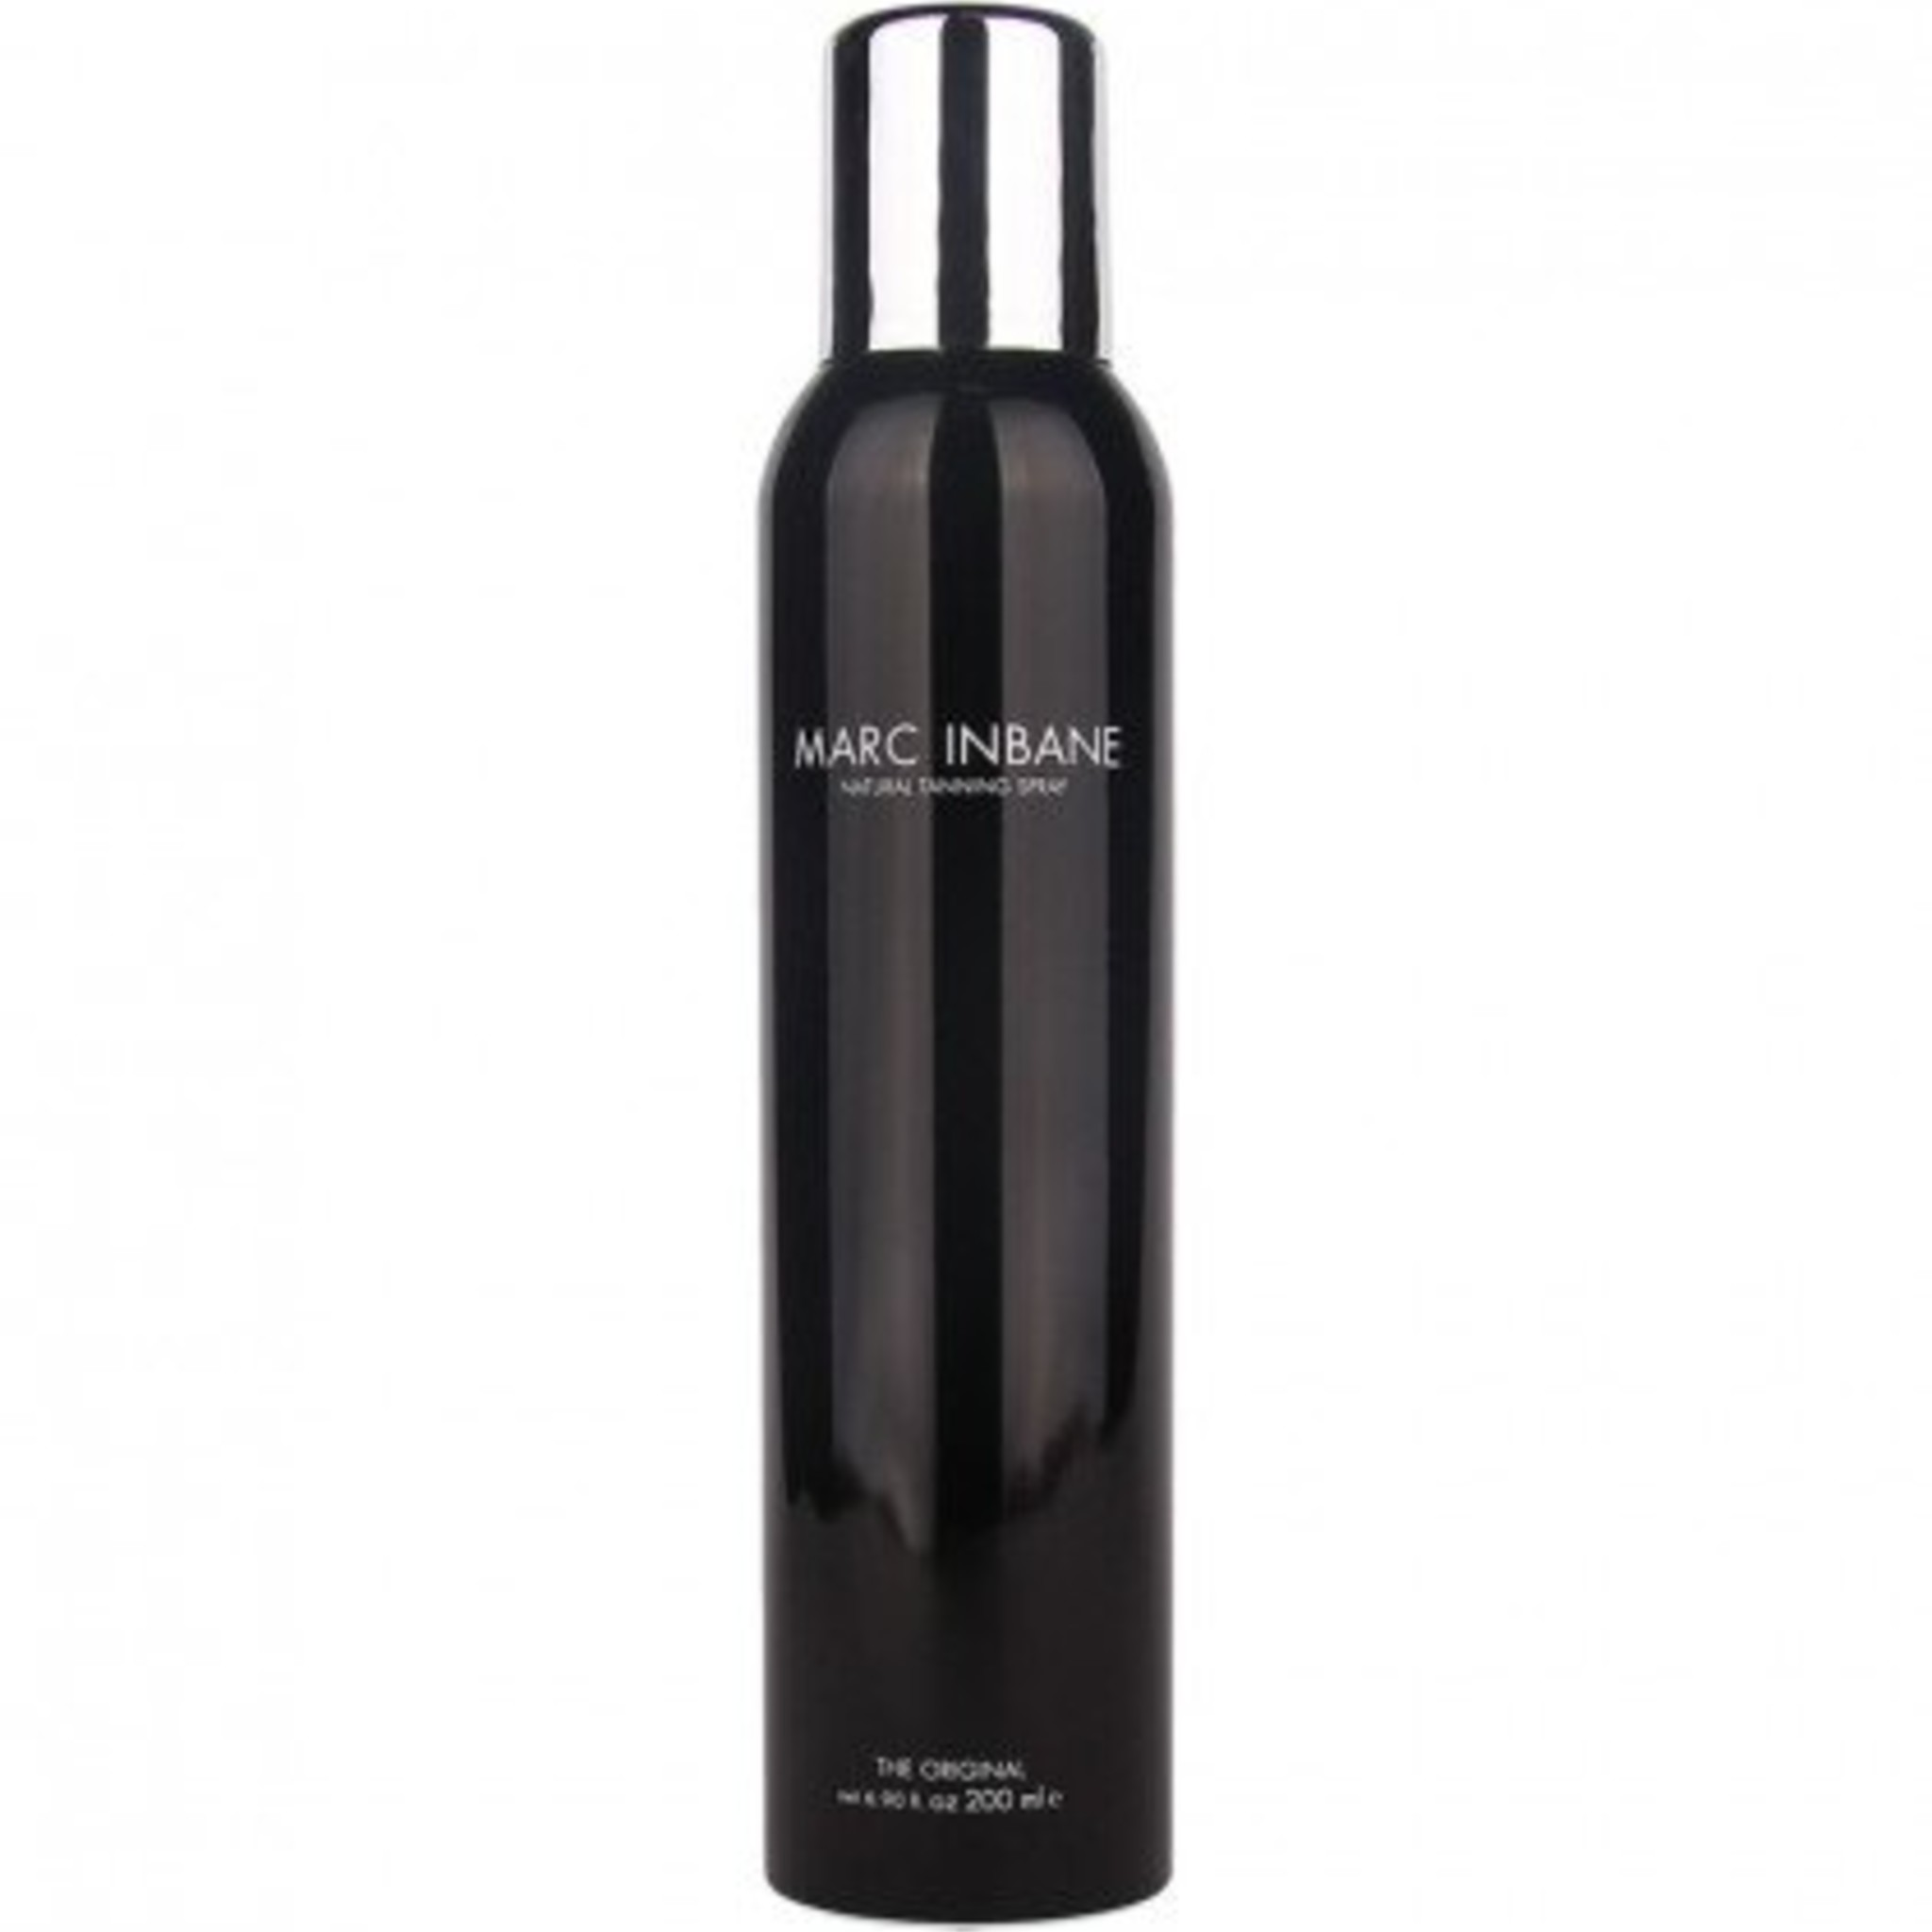 Marc Inbane Natural Tanning Spray Zelfbruiner - 200 ml